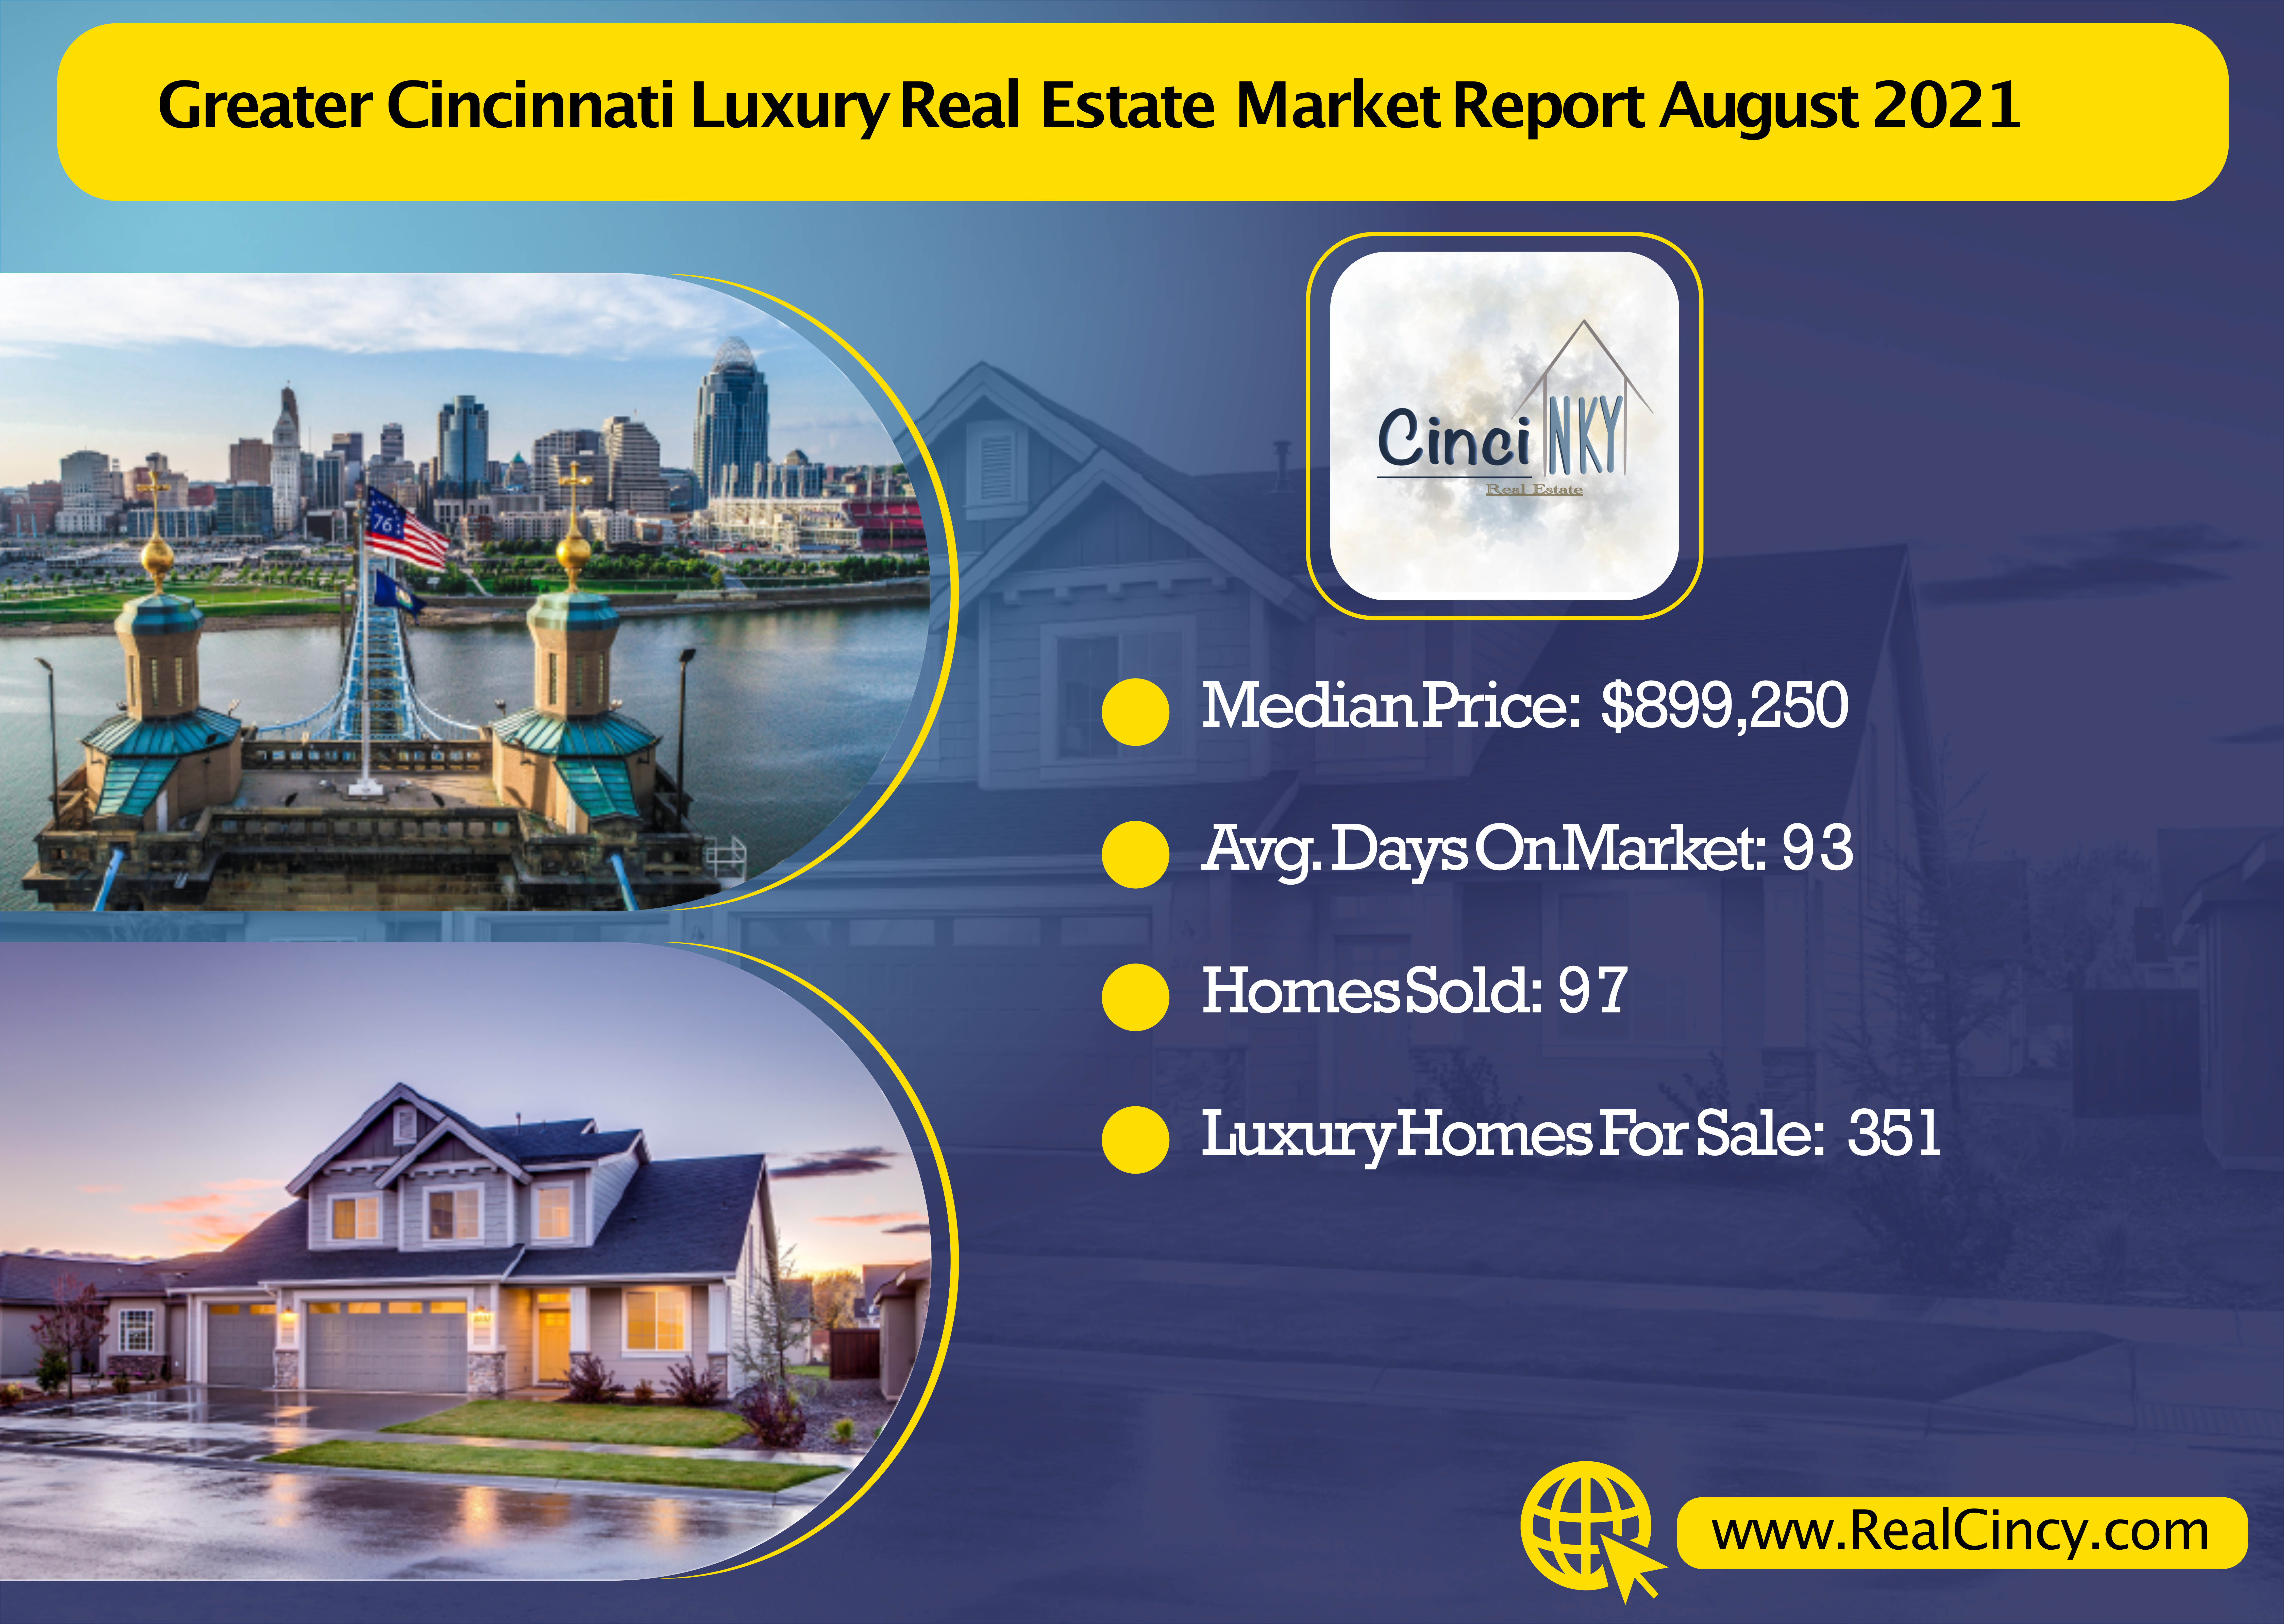 August 2021 Greater Cincinnati Luxury Real Estate Market Report